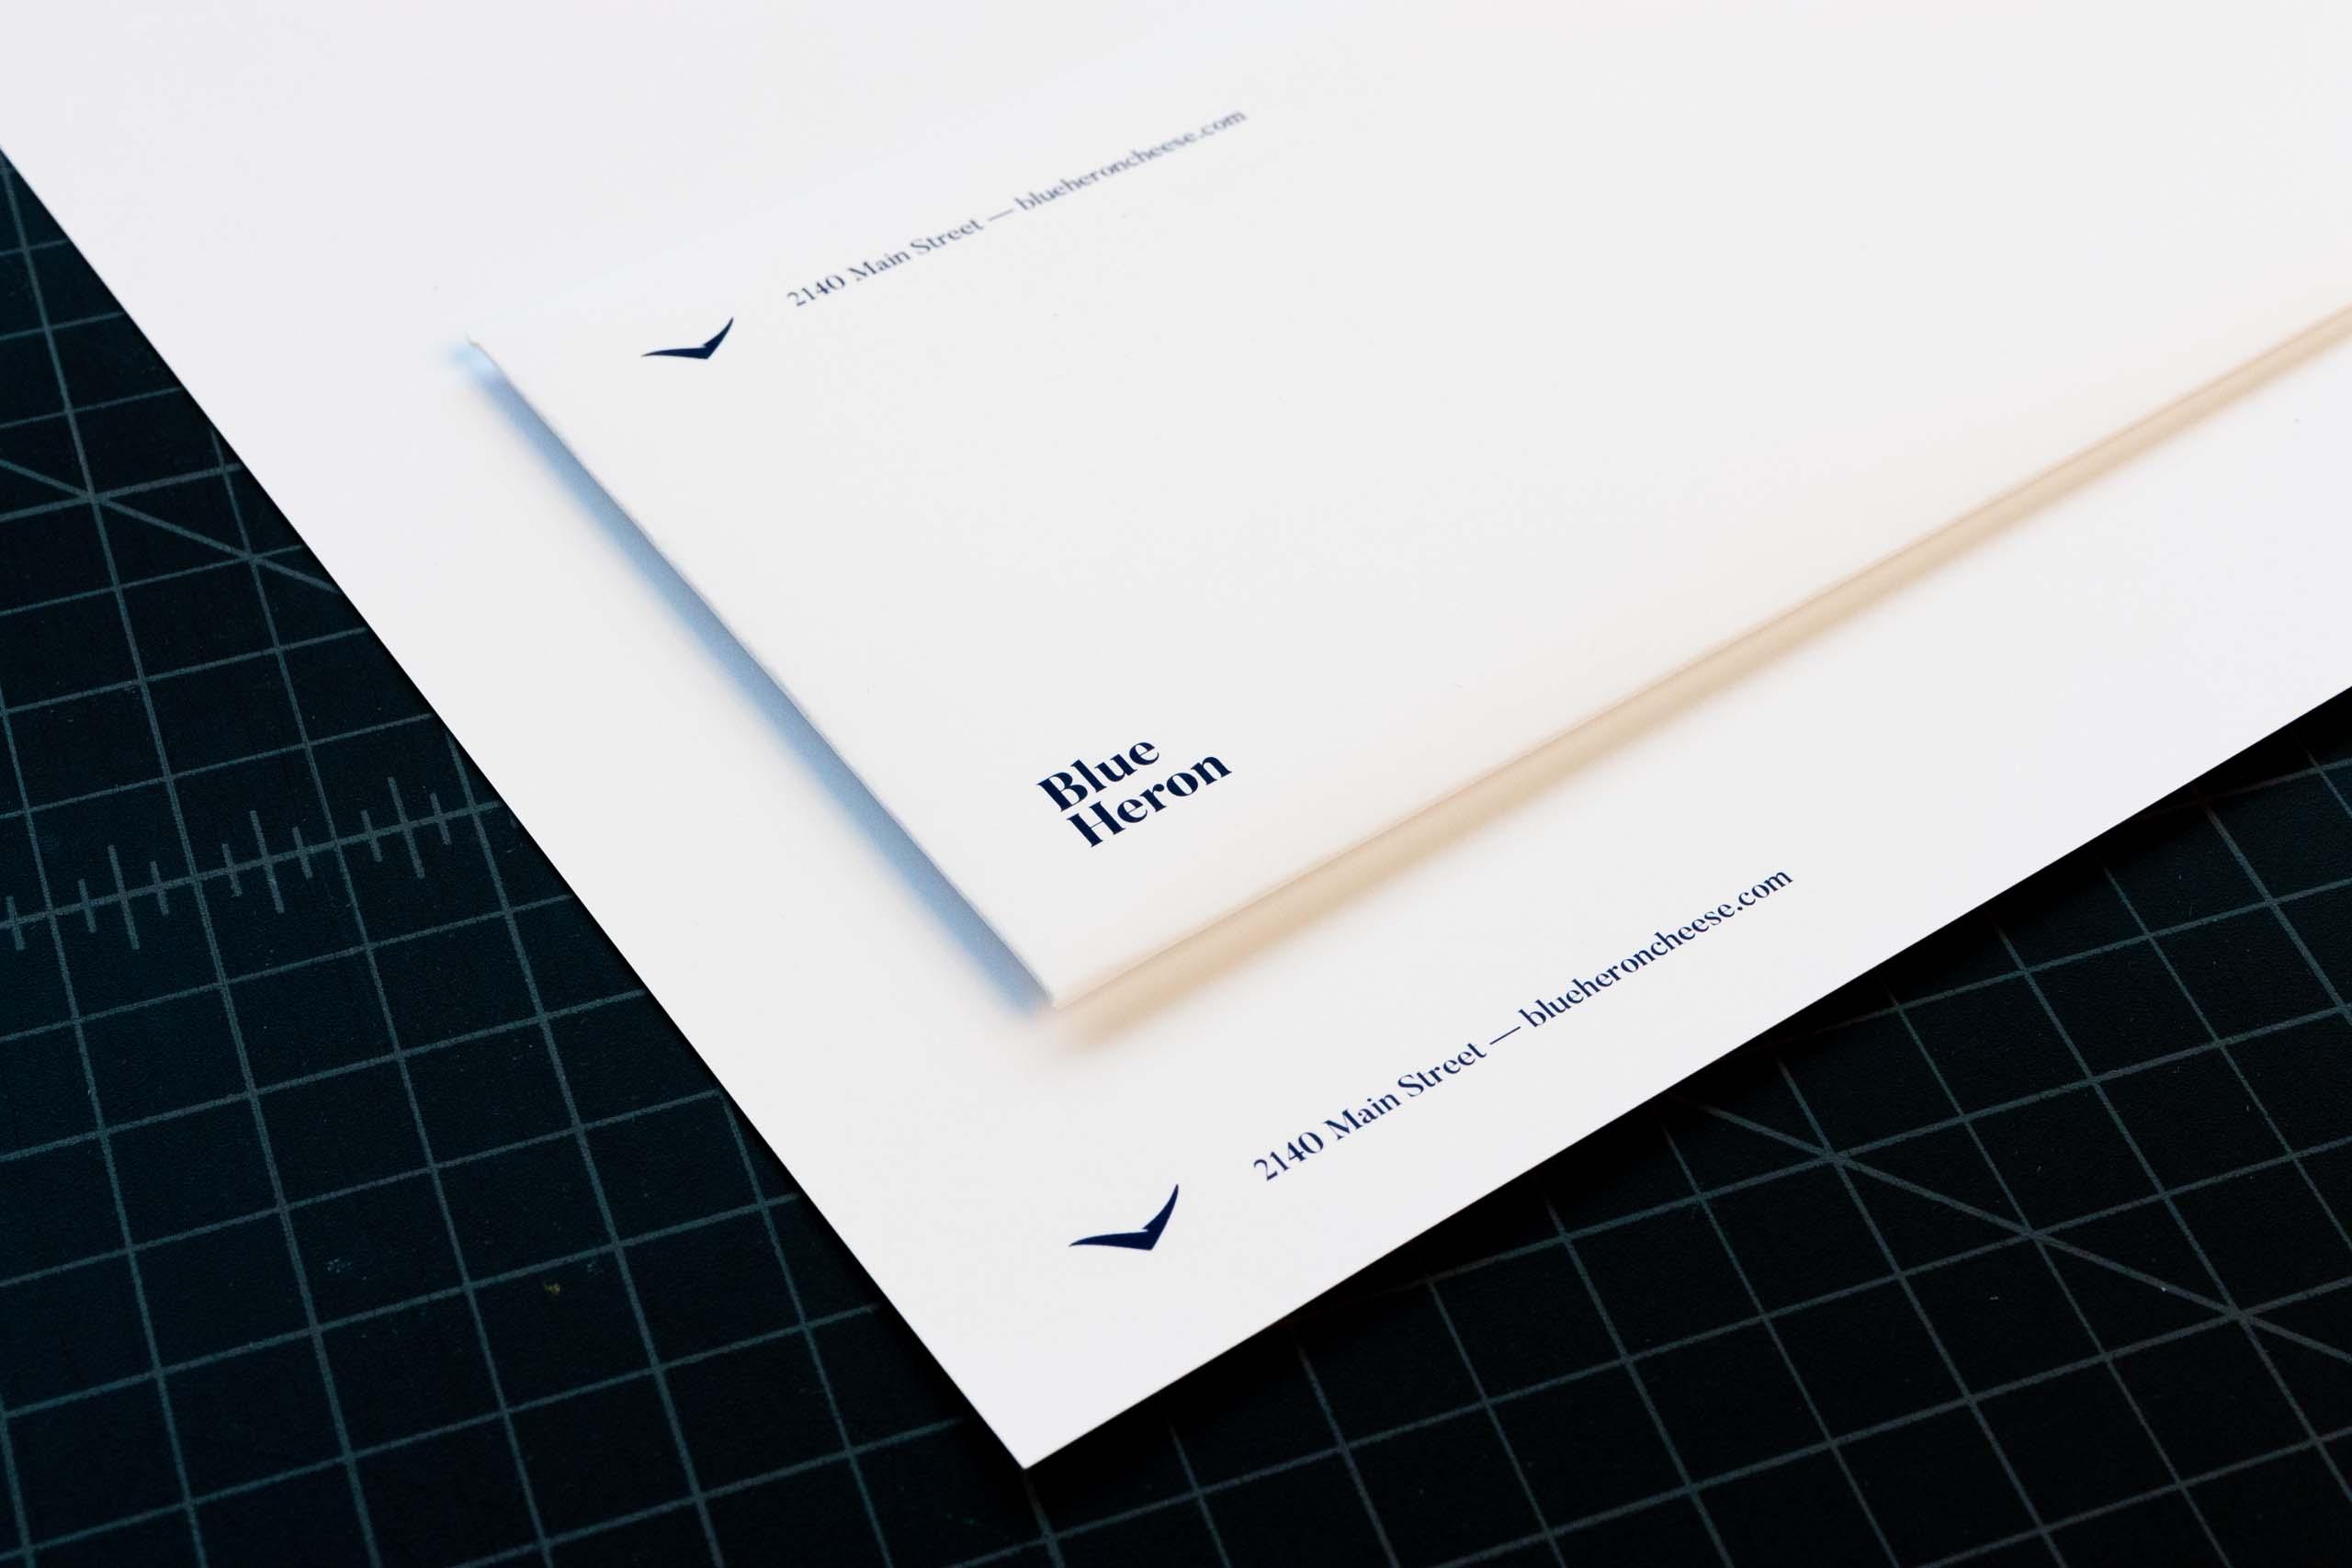 Blue Heron envelope and letterhead design — by Yagnyuk.